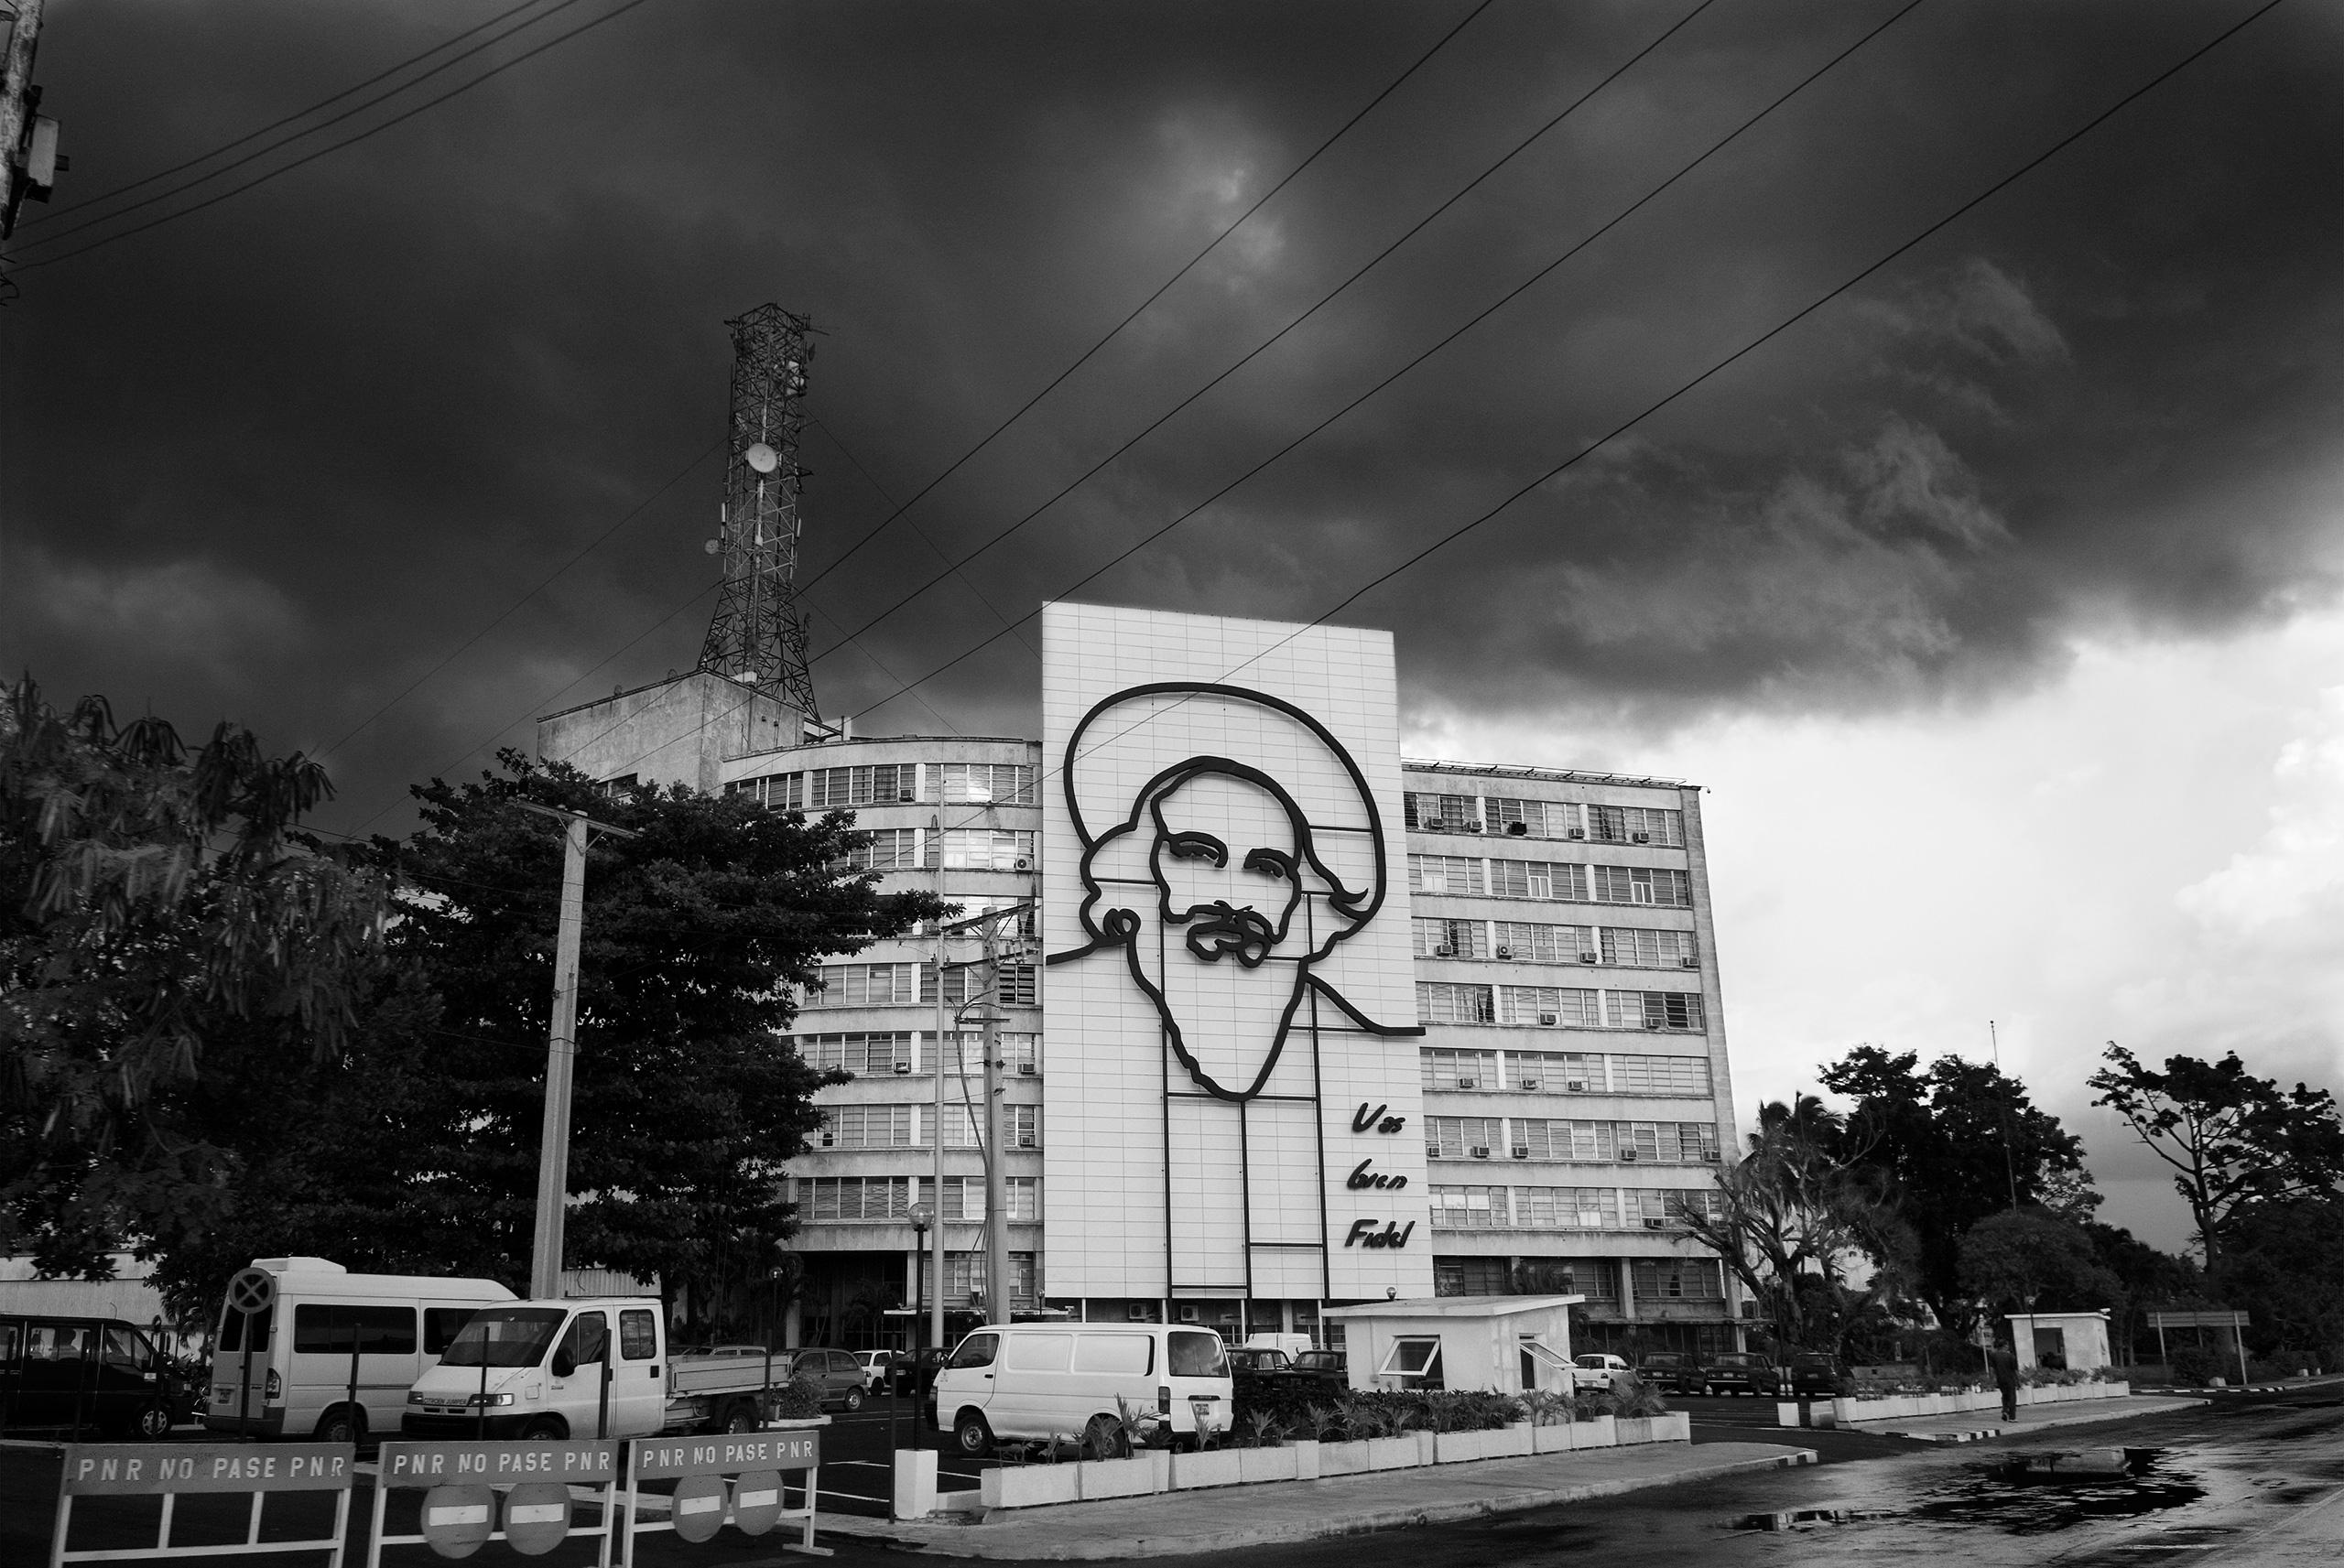 Camilo storm - Habana, Cuba - christofkessemeier   ello